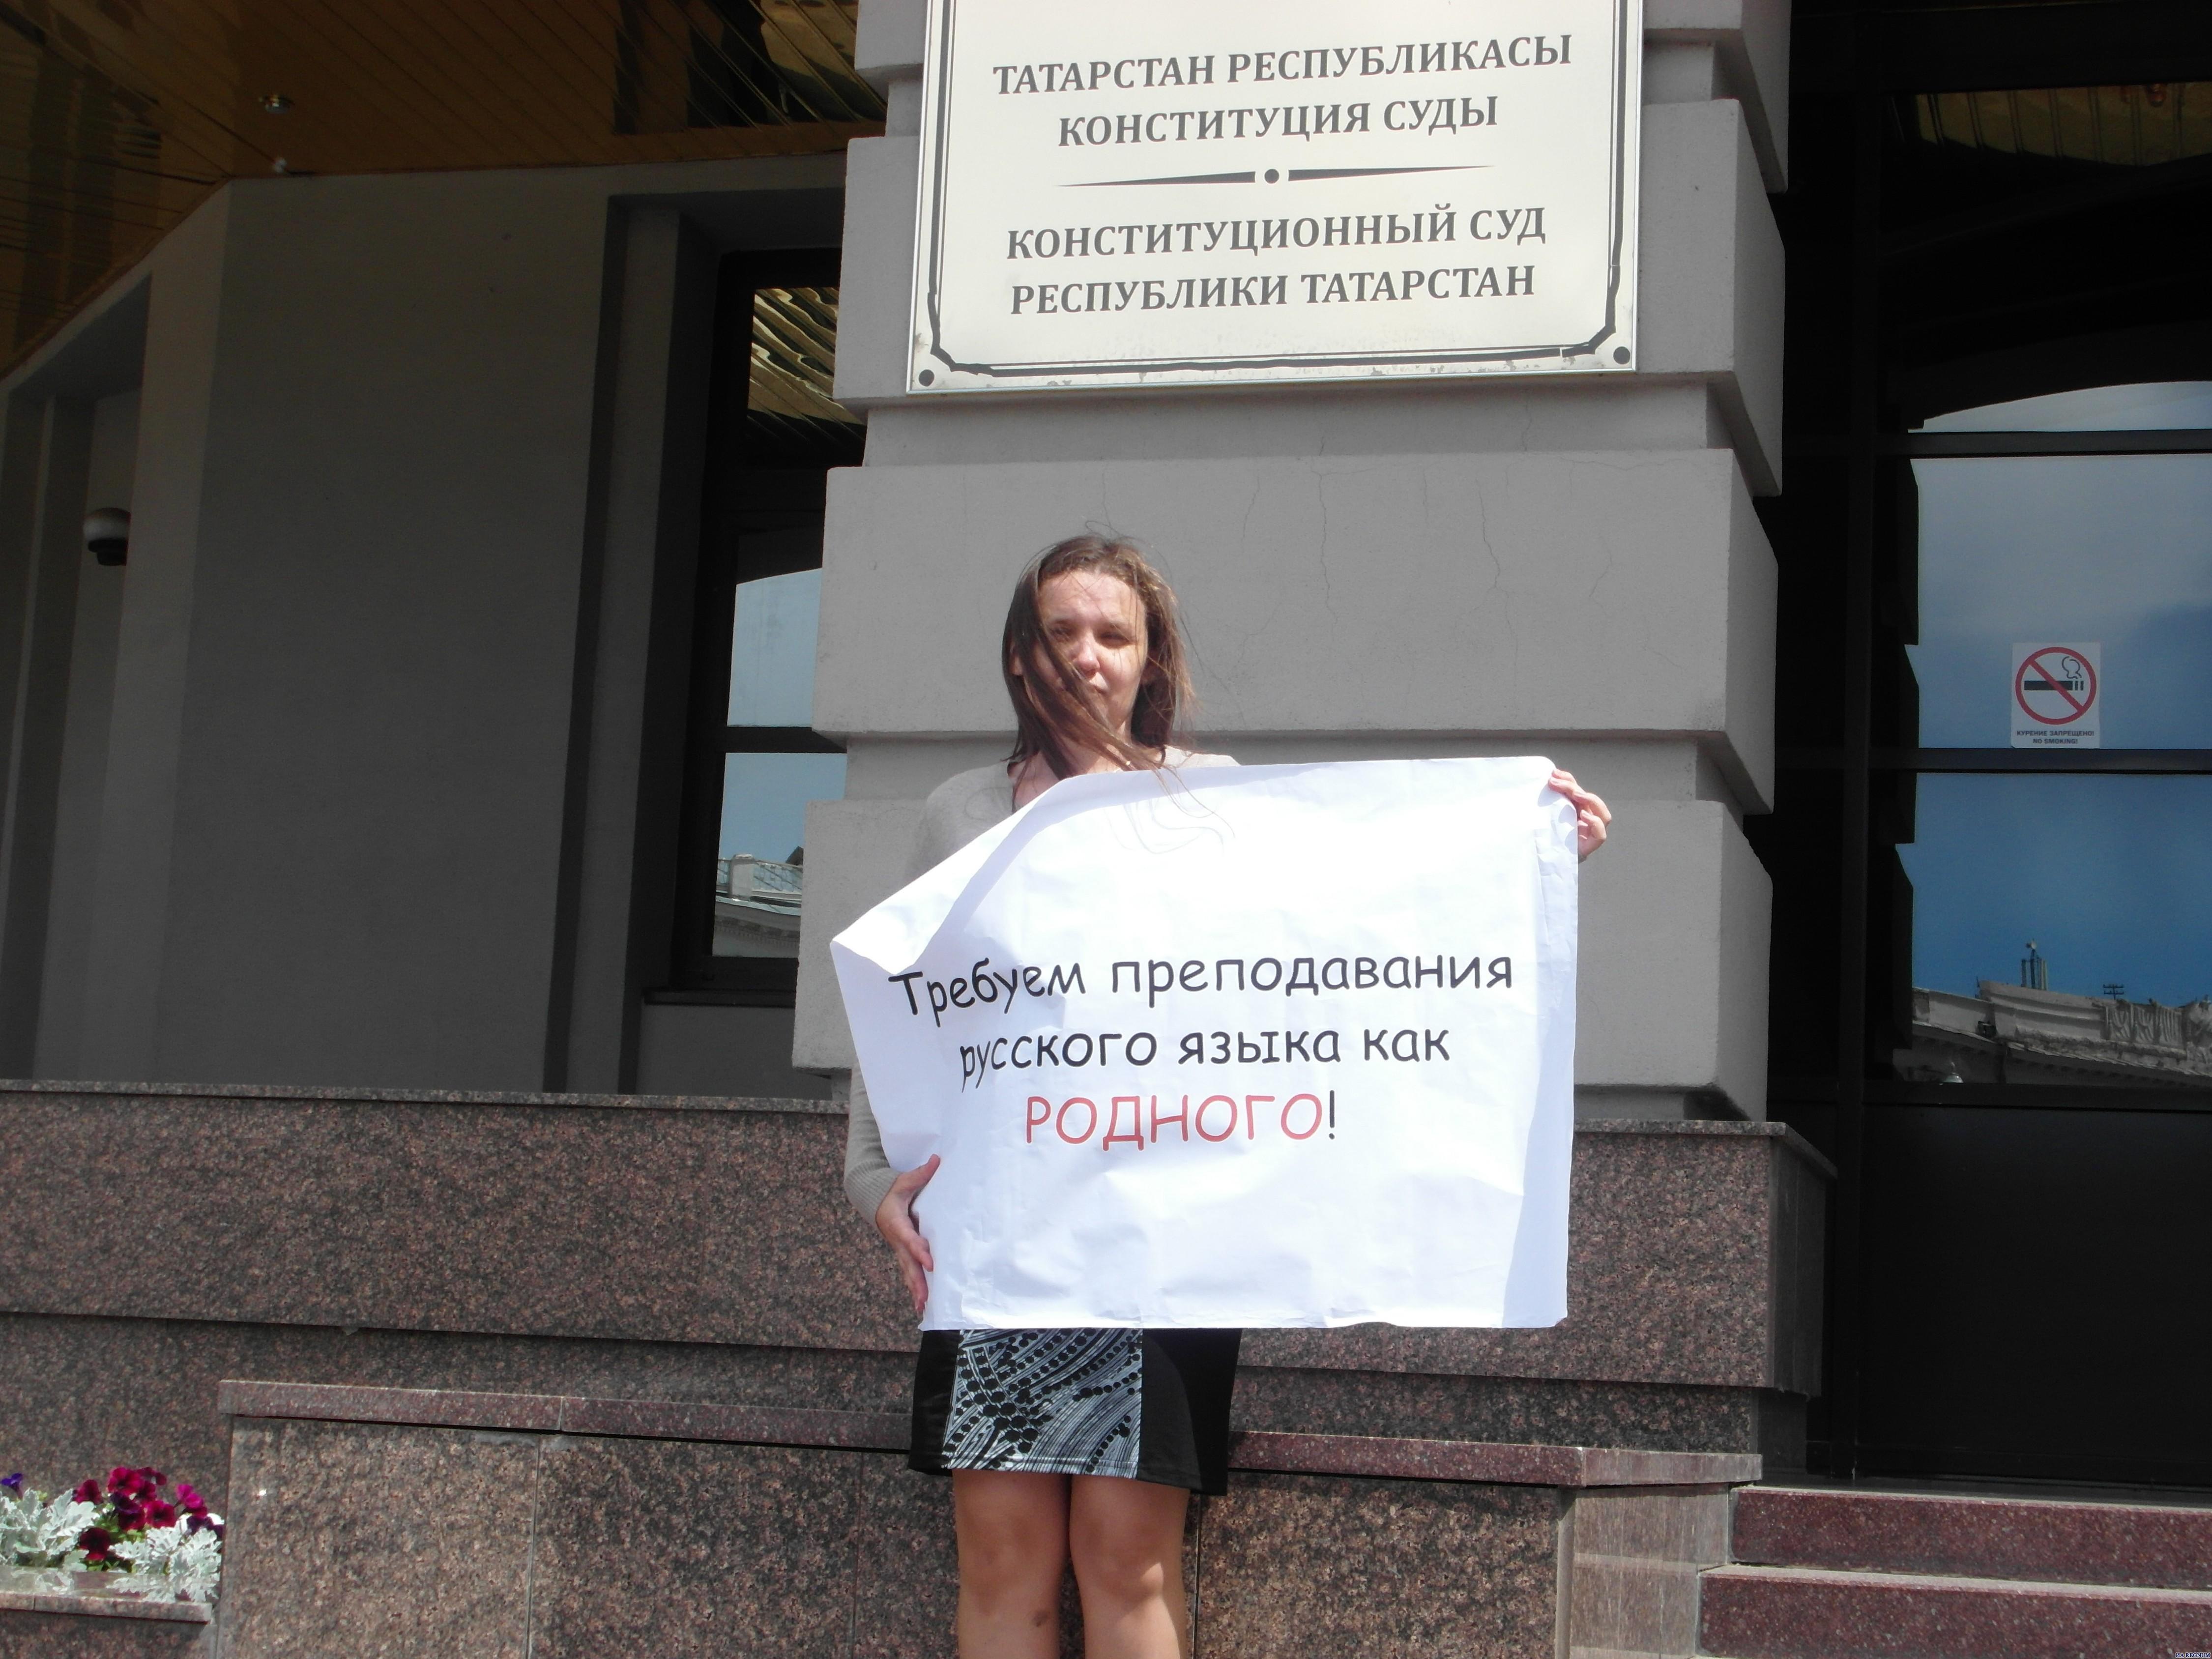 SAM_0632_big Власти Татарстана против языкового единства России? Анализ - прогноз Татарстан